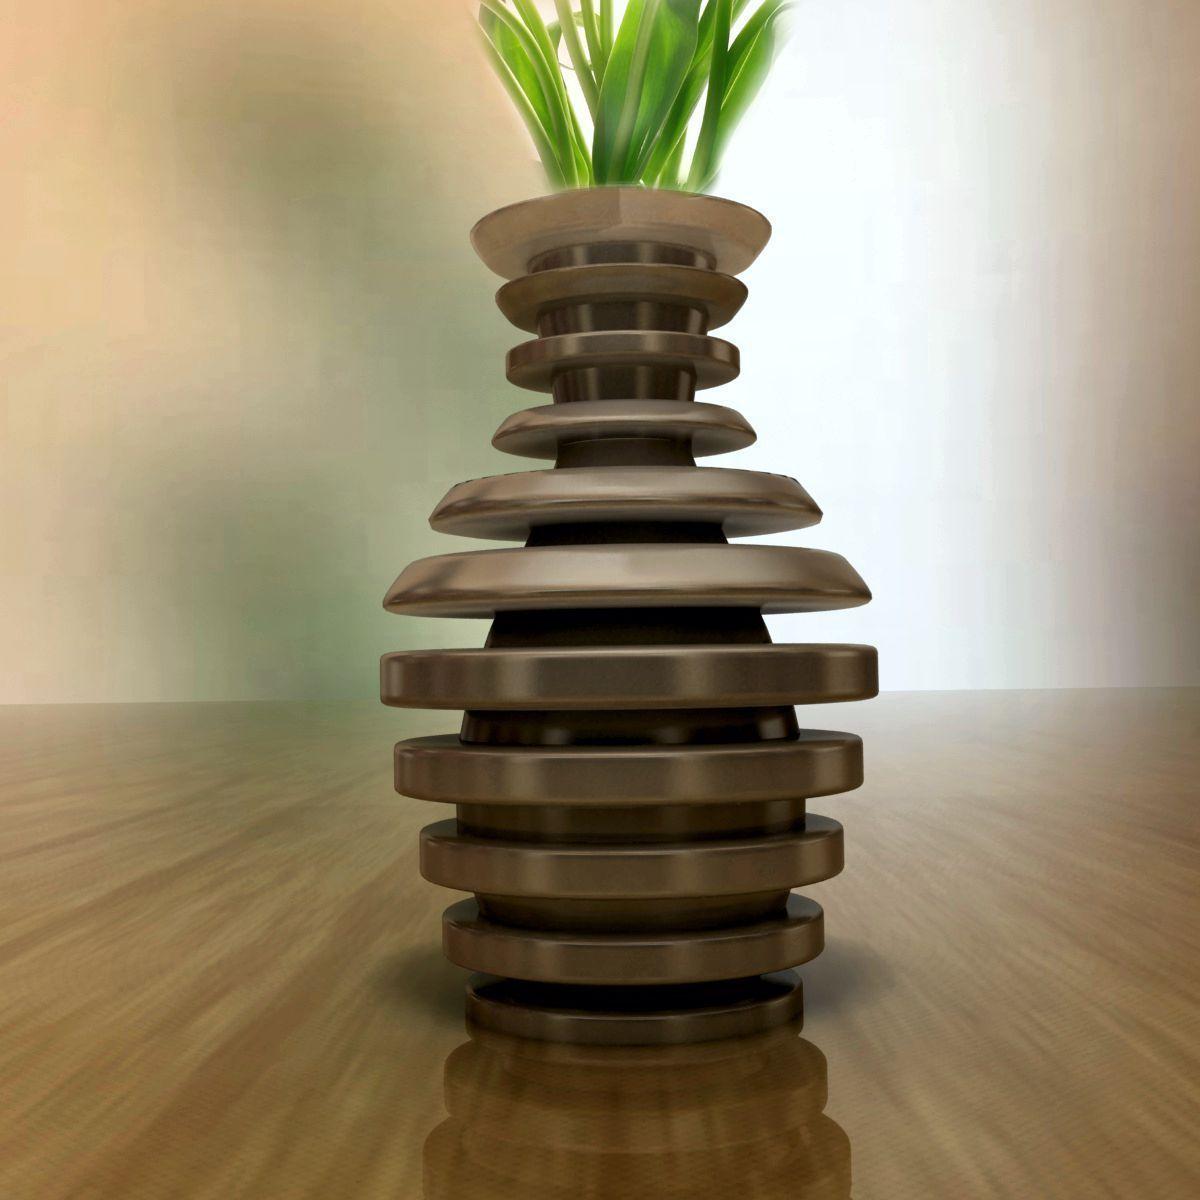 Amazing Vase 3d Model 3d Printable Stl Cgtrader Com